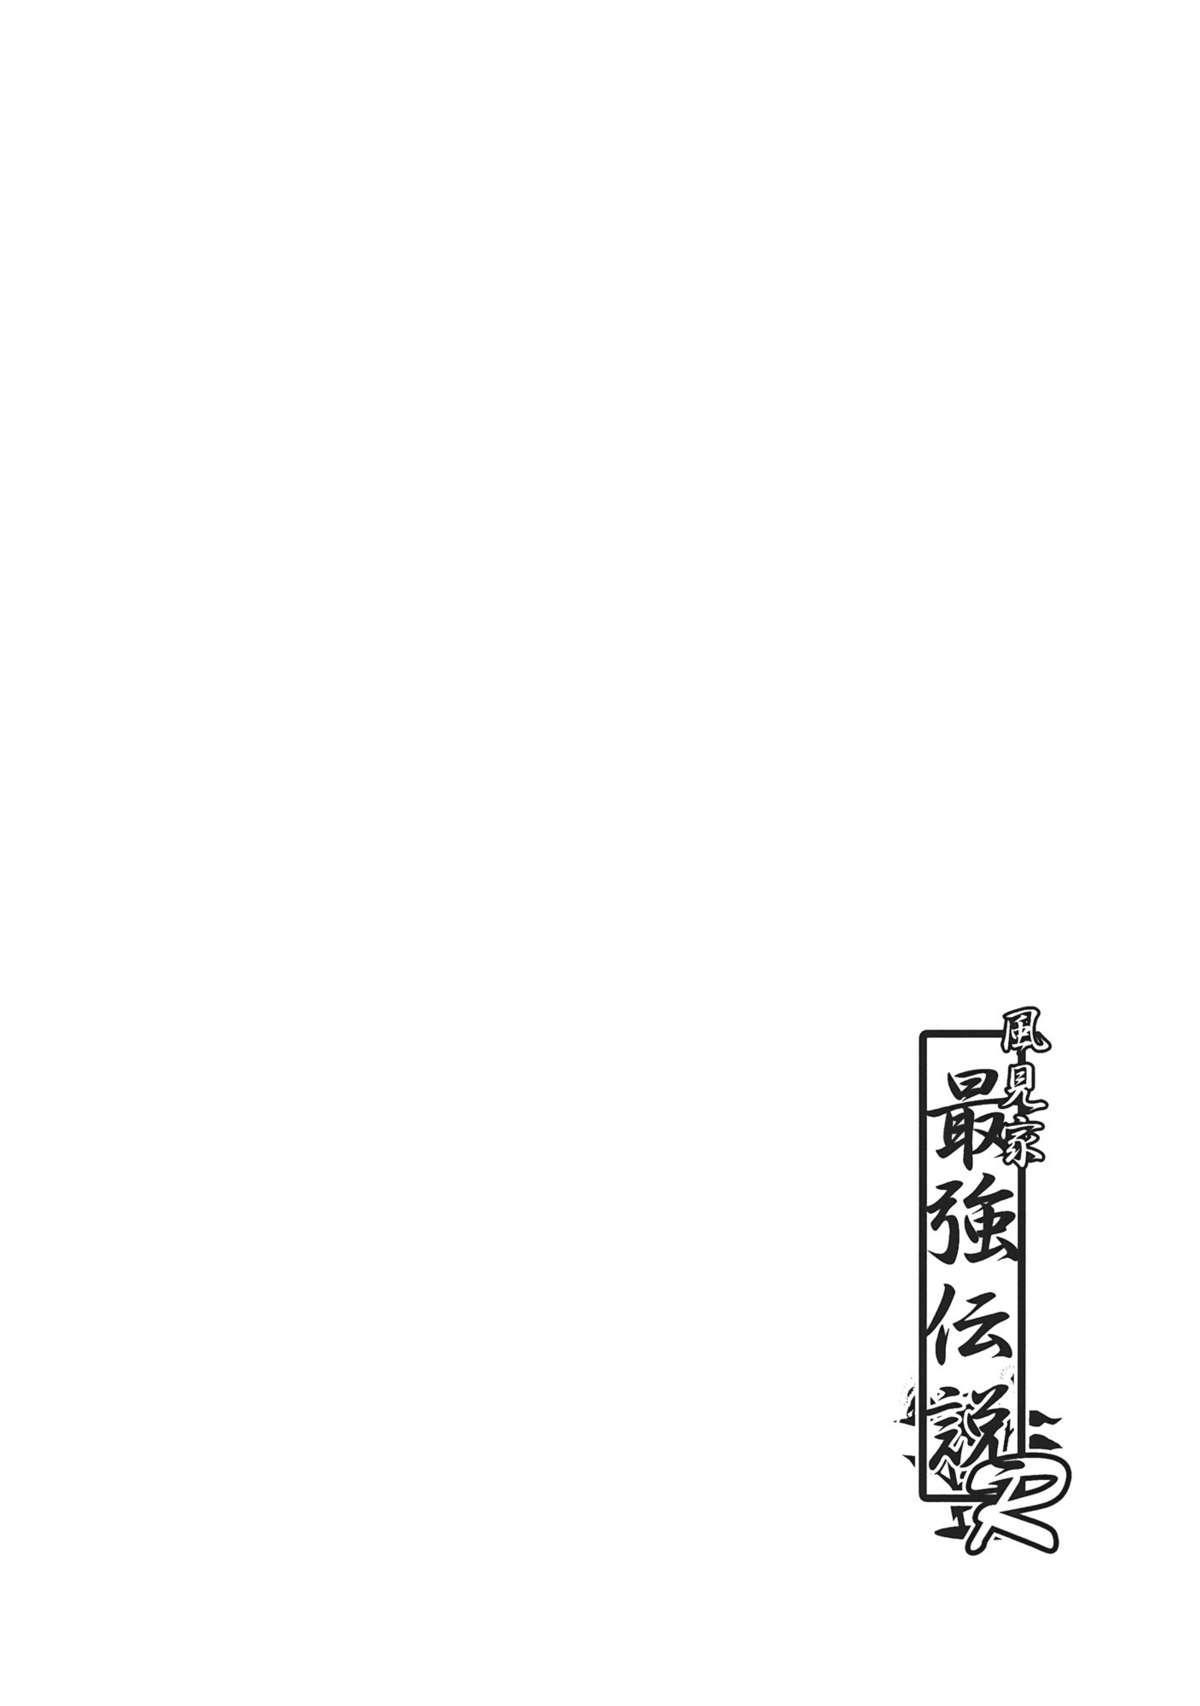 Kazami-ke Saikyou Densetsu R 3